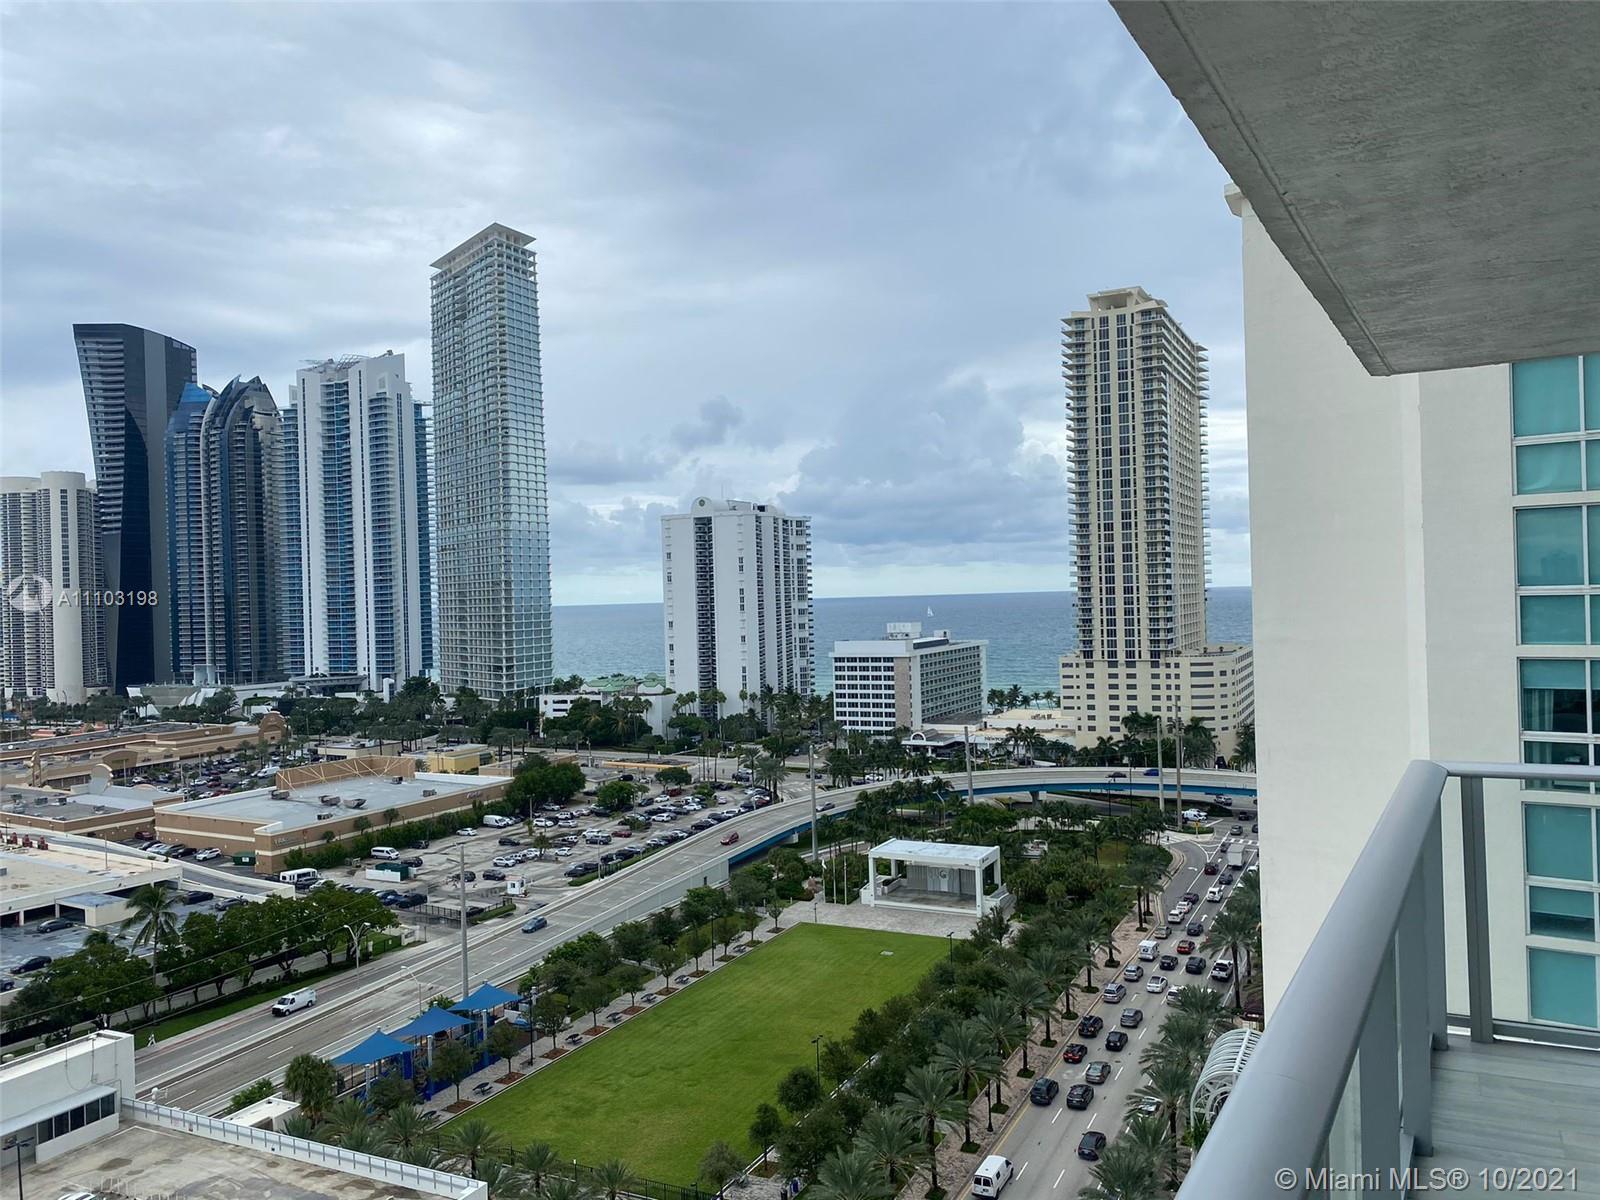 Parque Towers Condo,For Rent,Parque Towers Brickell,realty,broker,condos near me